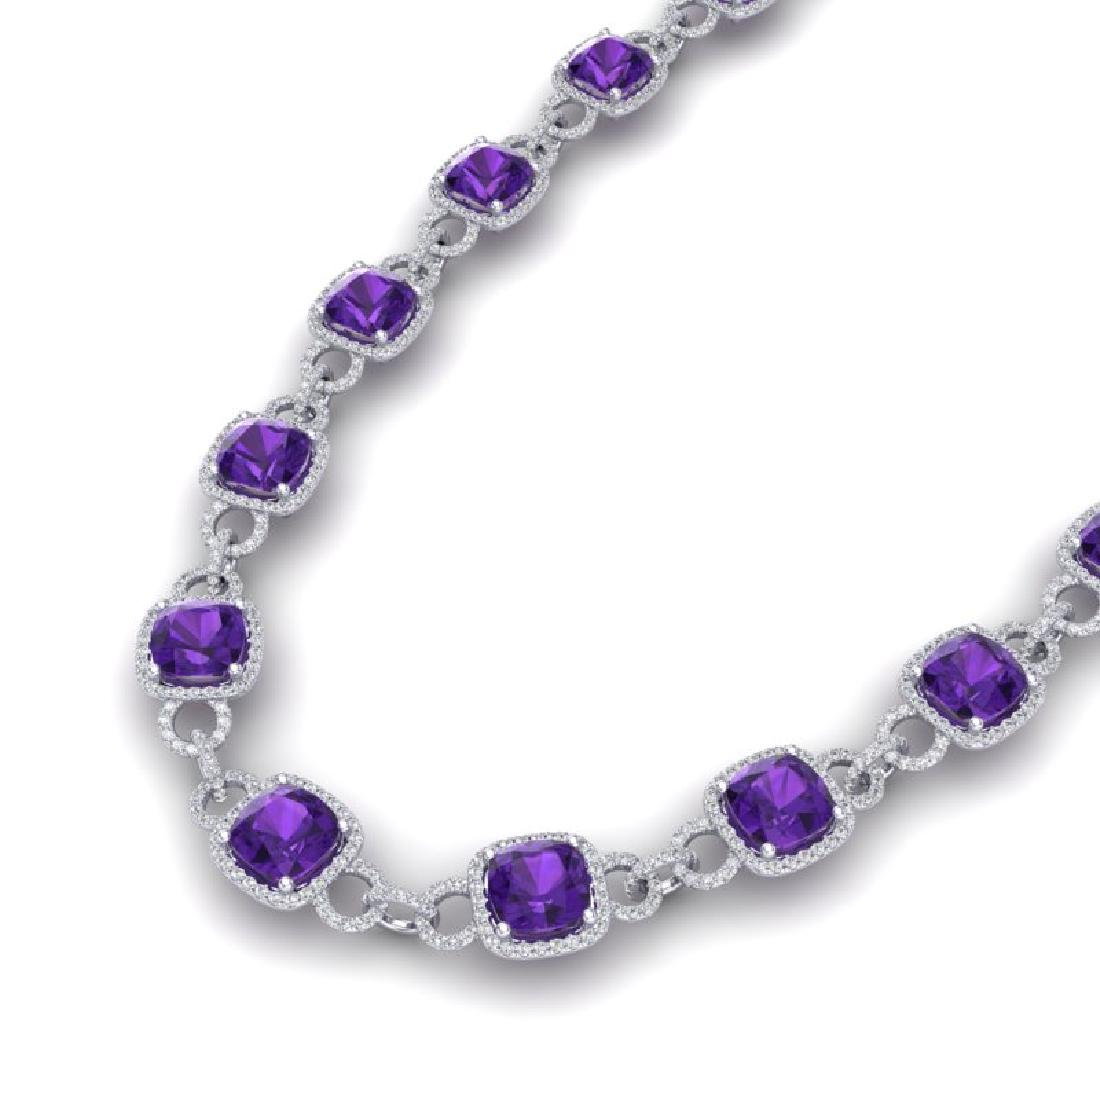 66 CTW Amethyst & VS/SI Diamond Necklace 14K White Gold